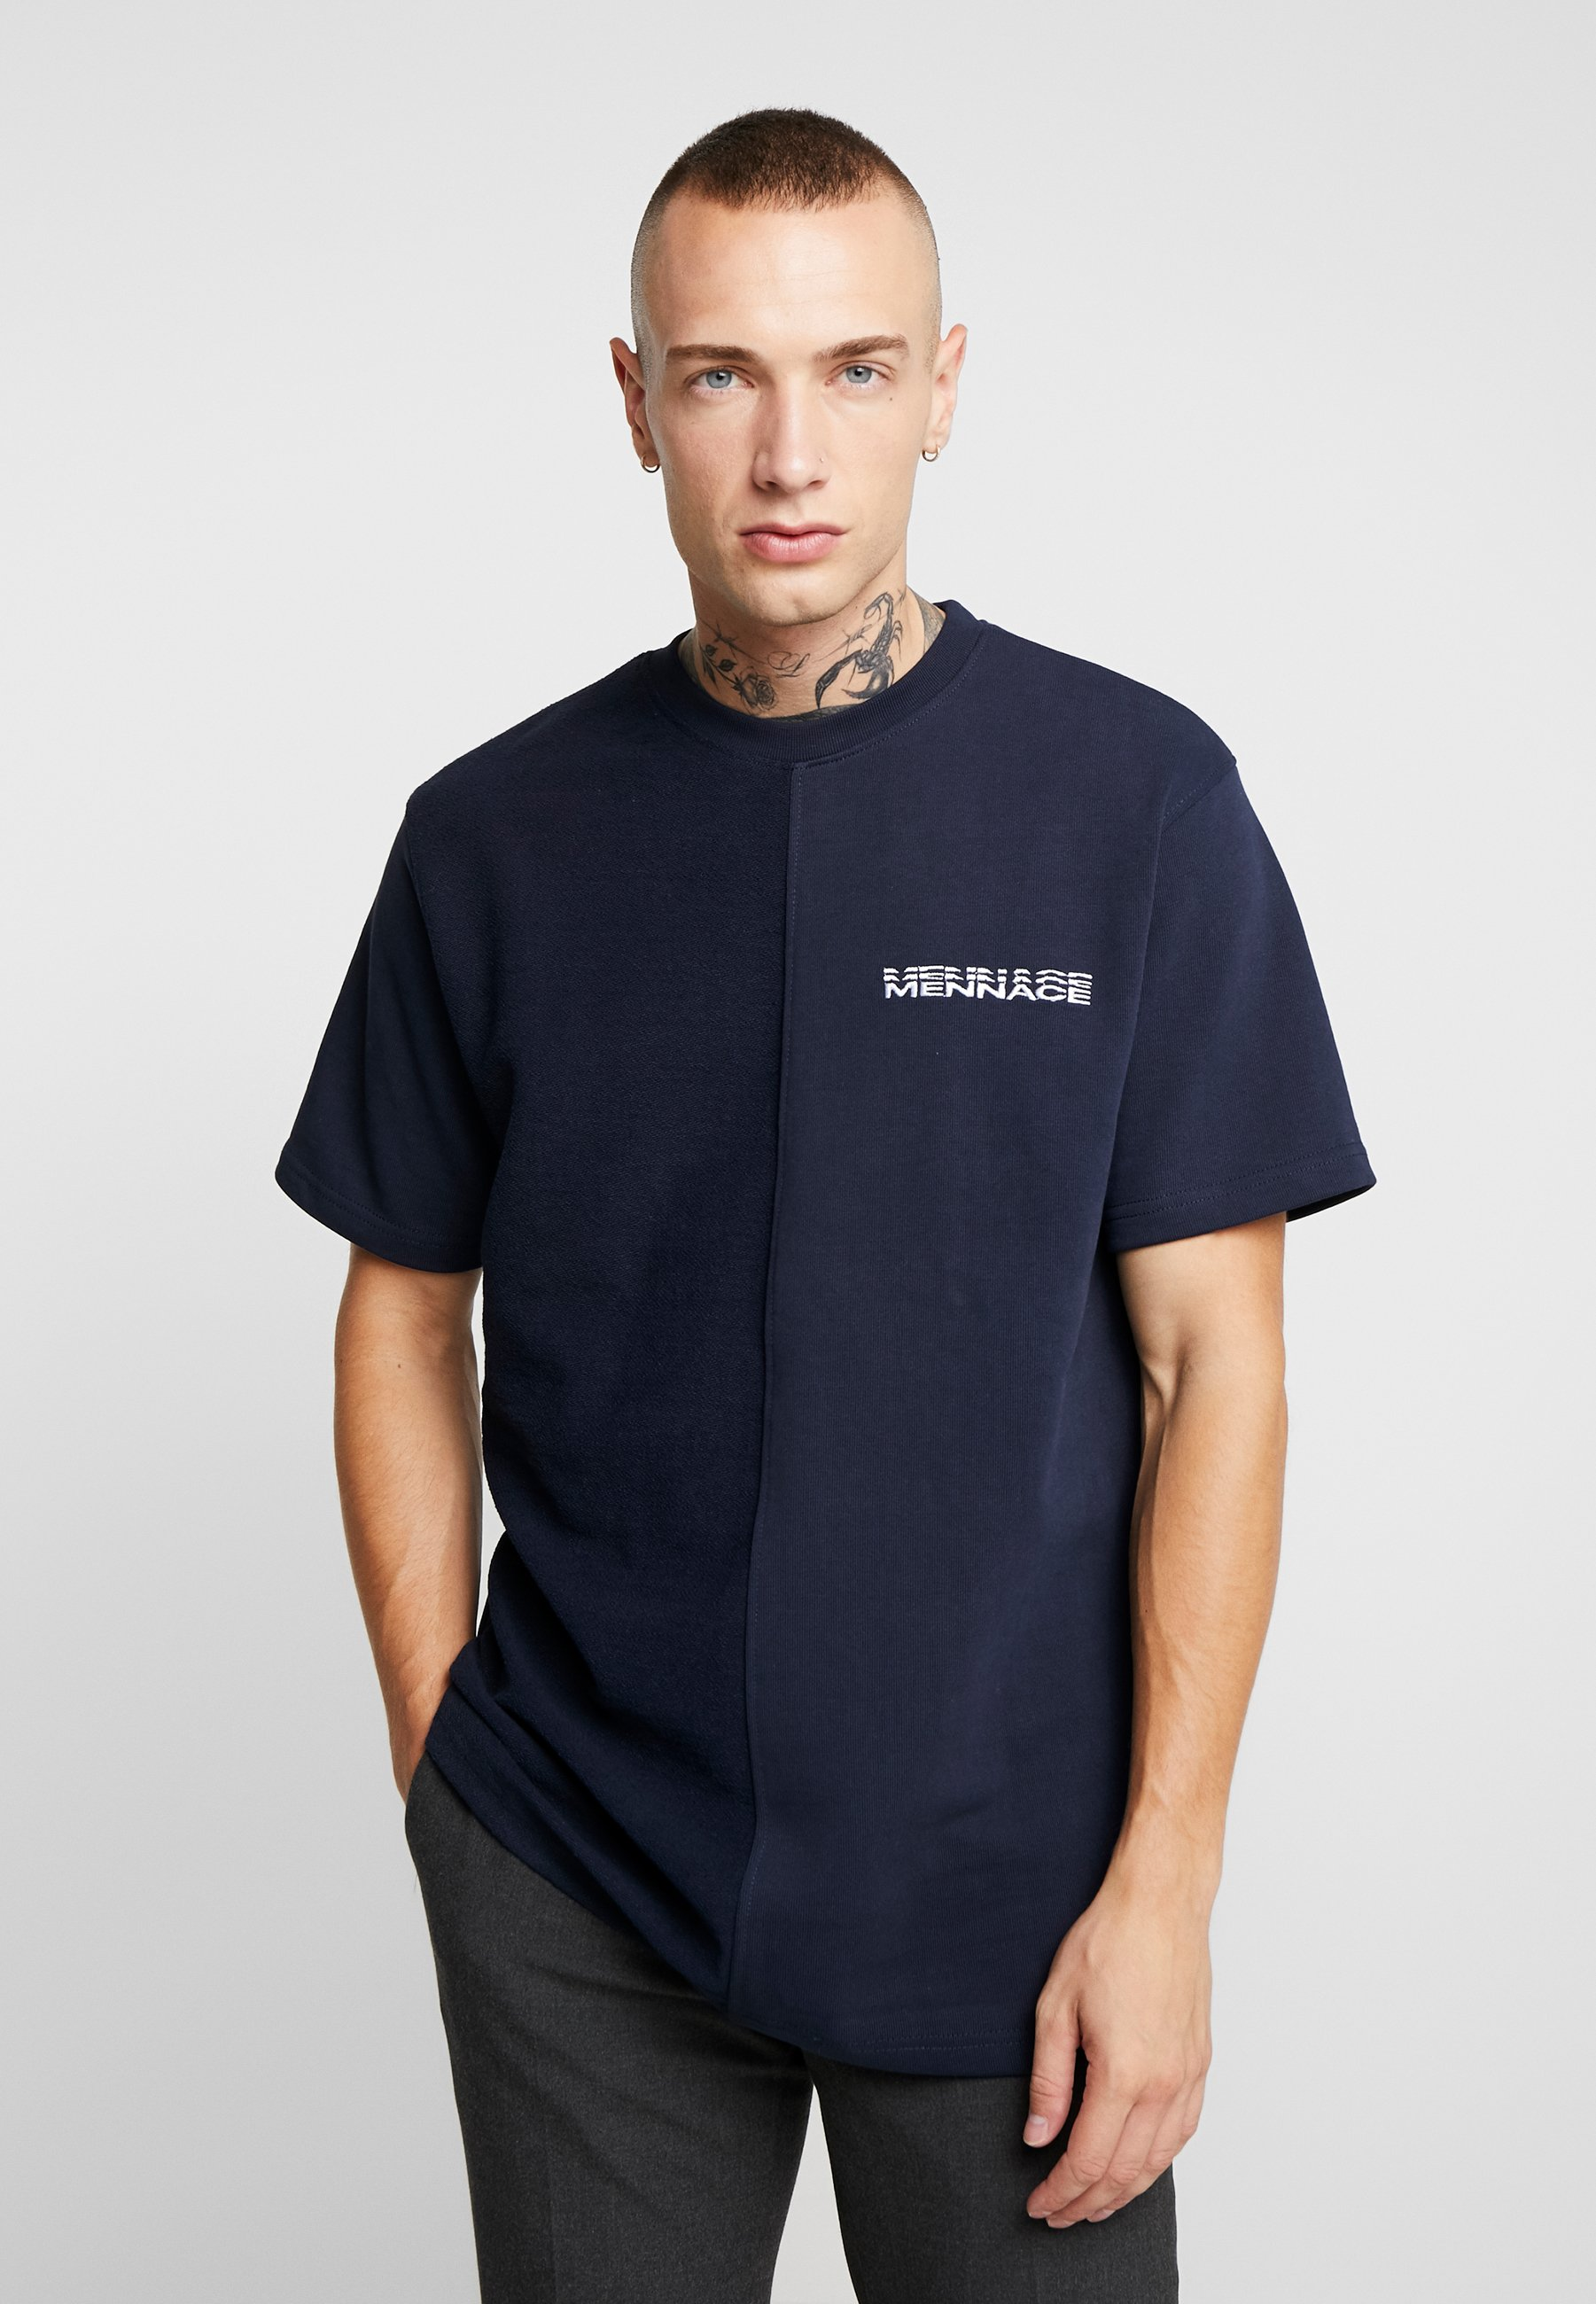 Navy Contrast Mennace Imprimé TextureT shirt 0PXZ8kNnOw